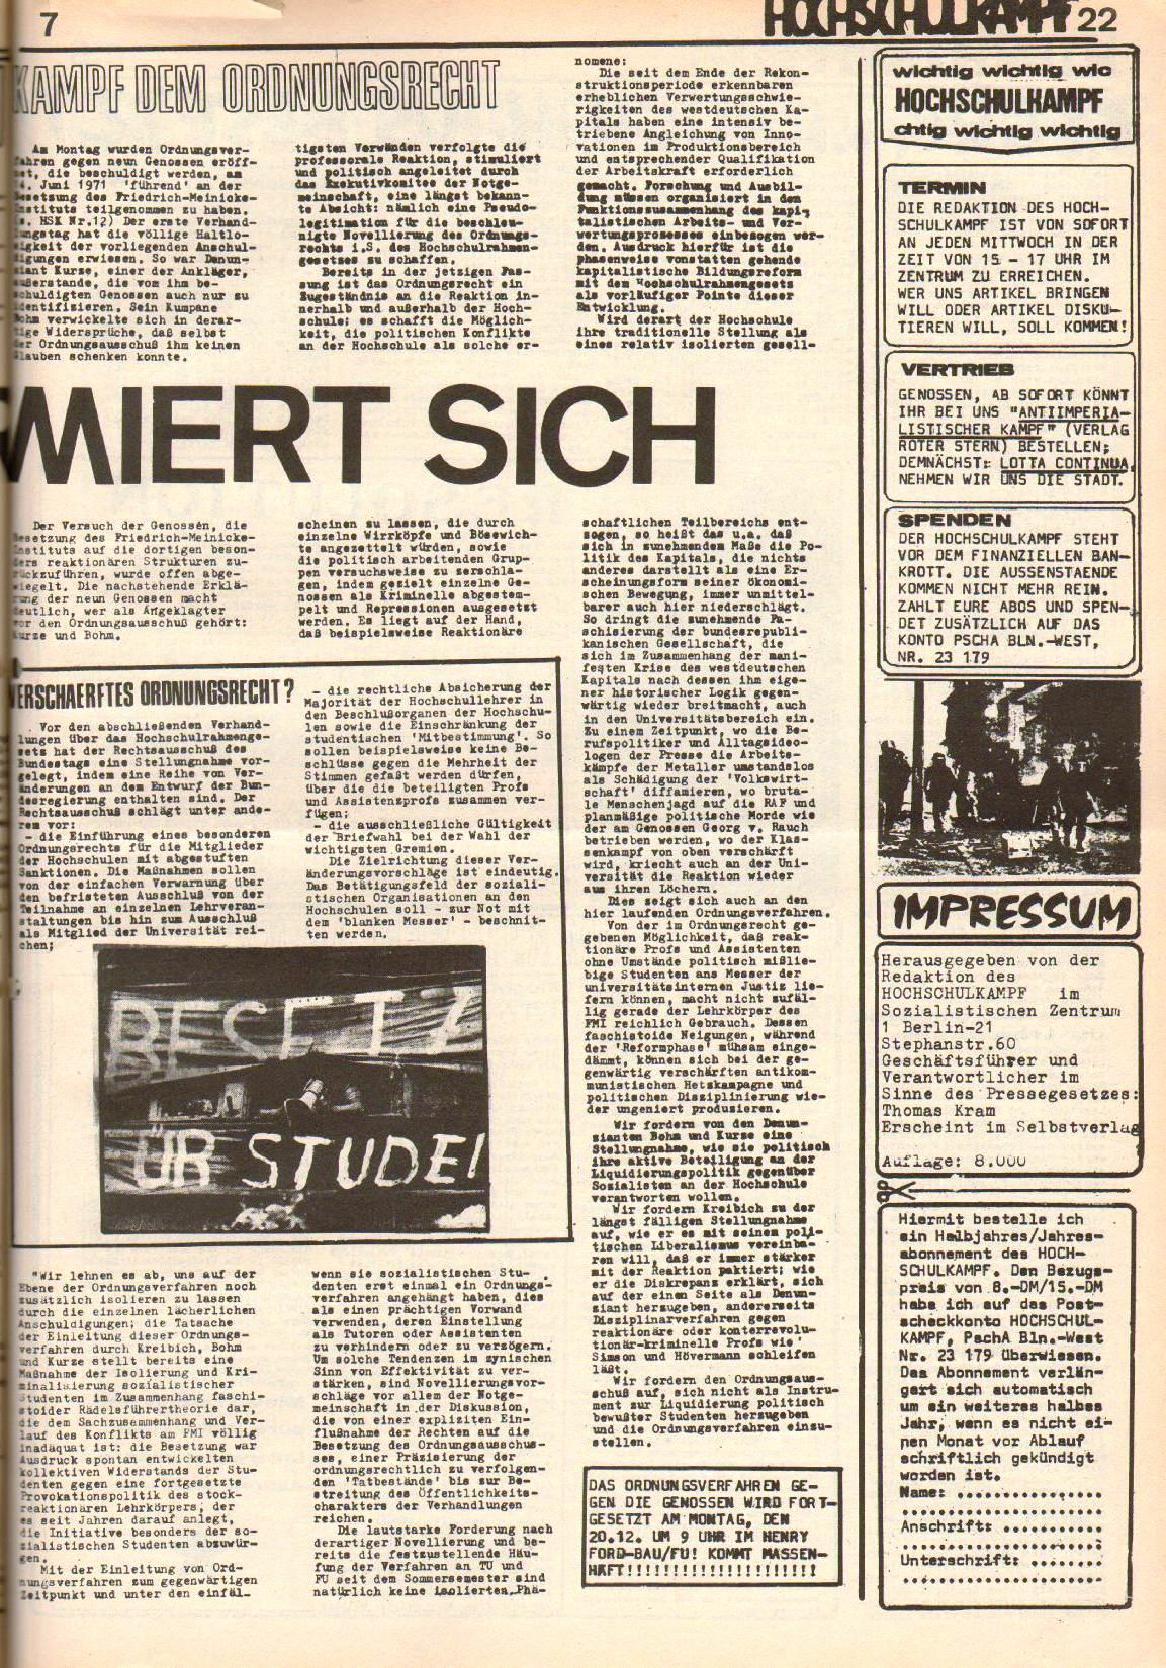 Berlin_Hochschulkampf_1971_22_07